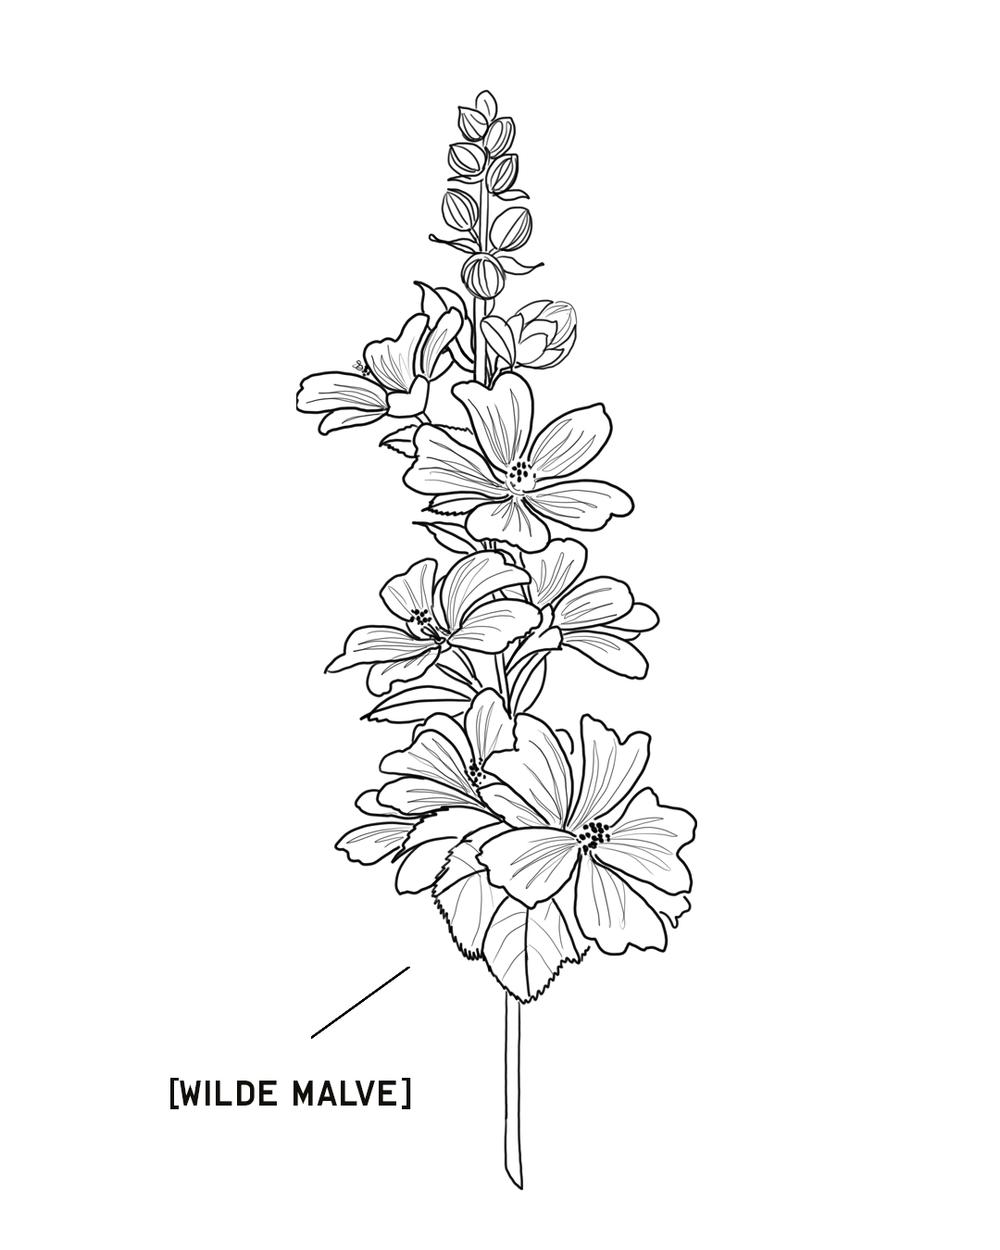 Malve-1350X1080.png